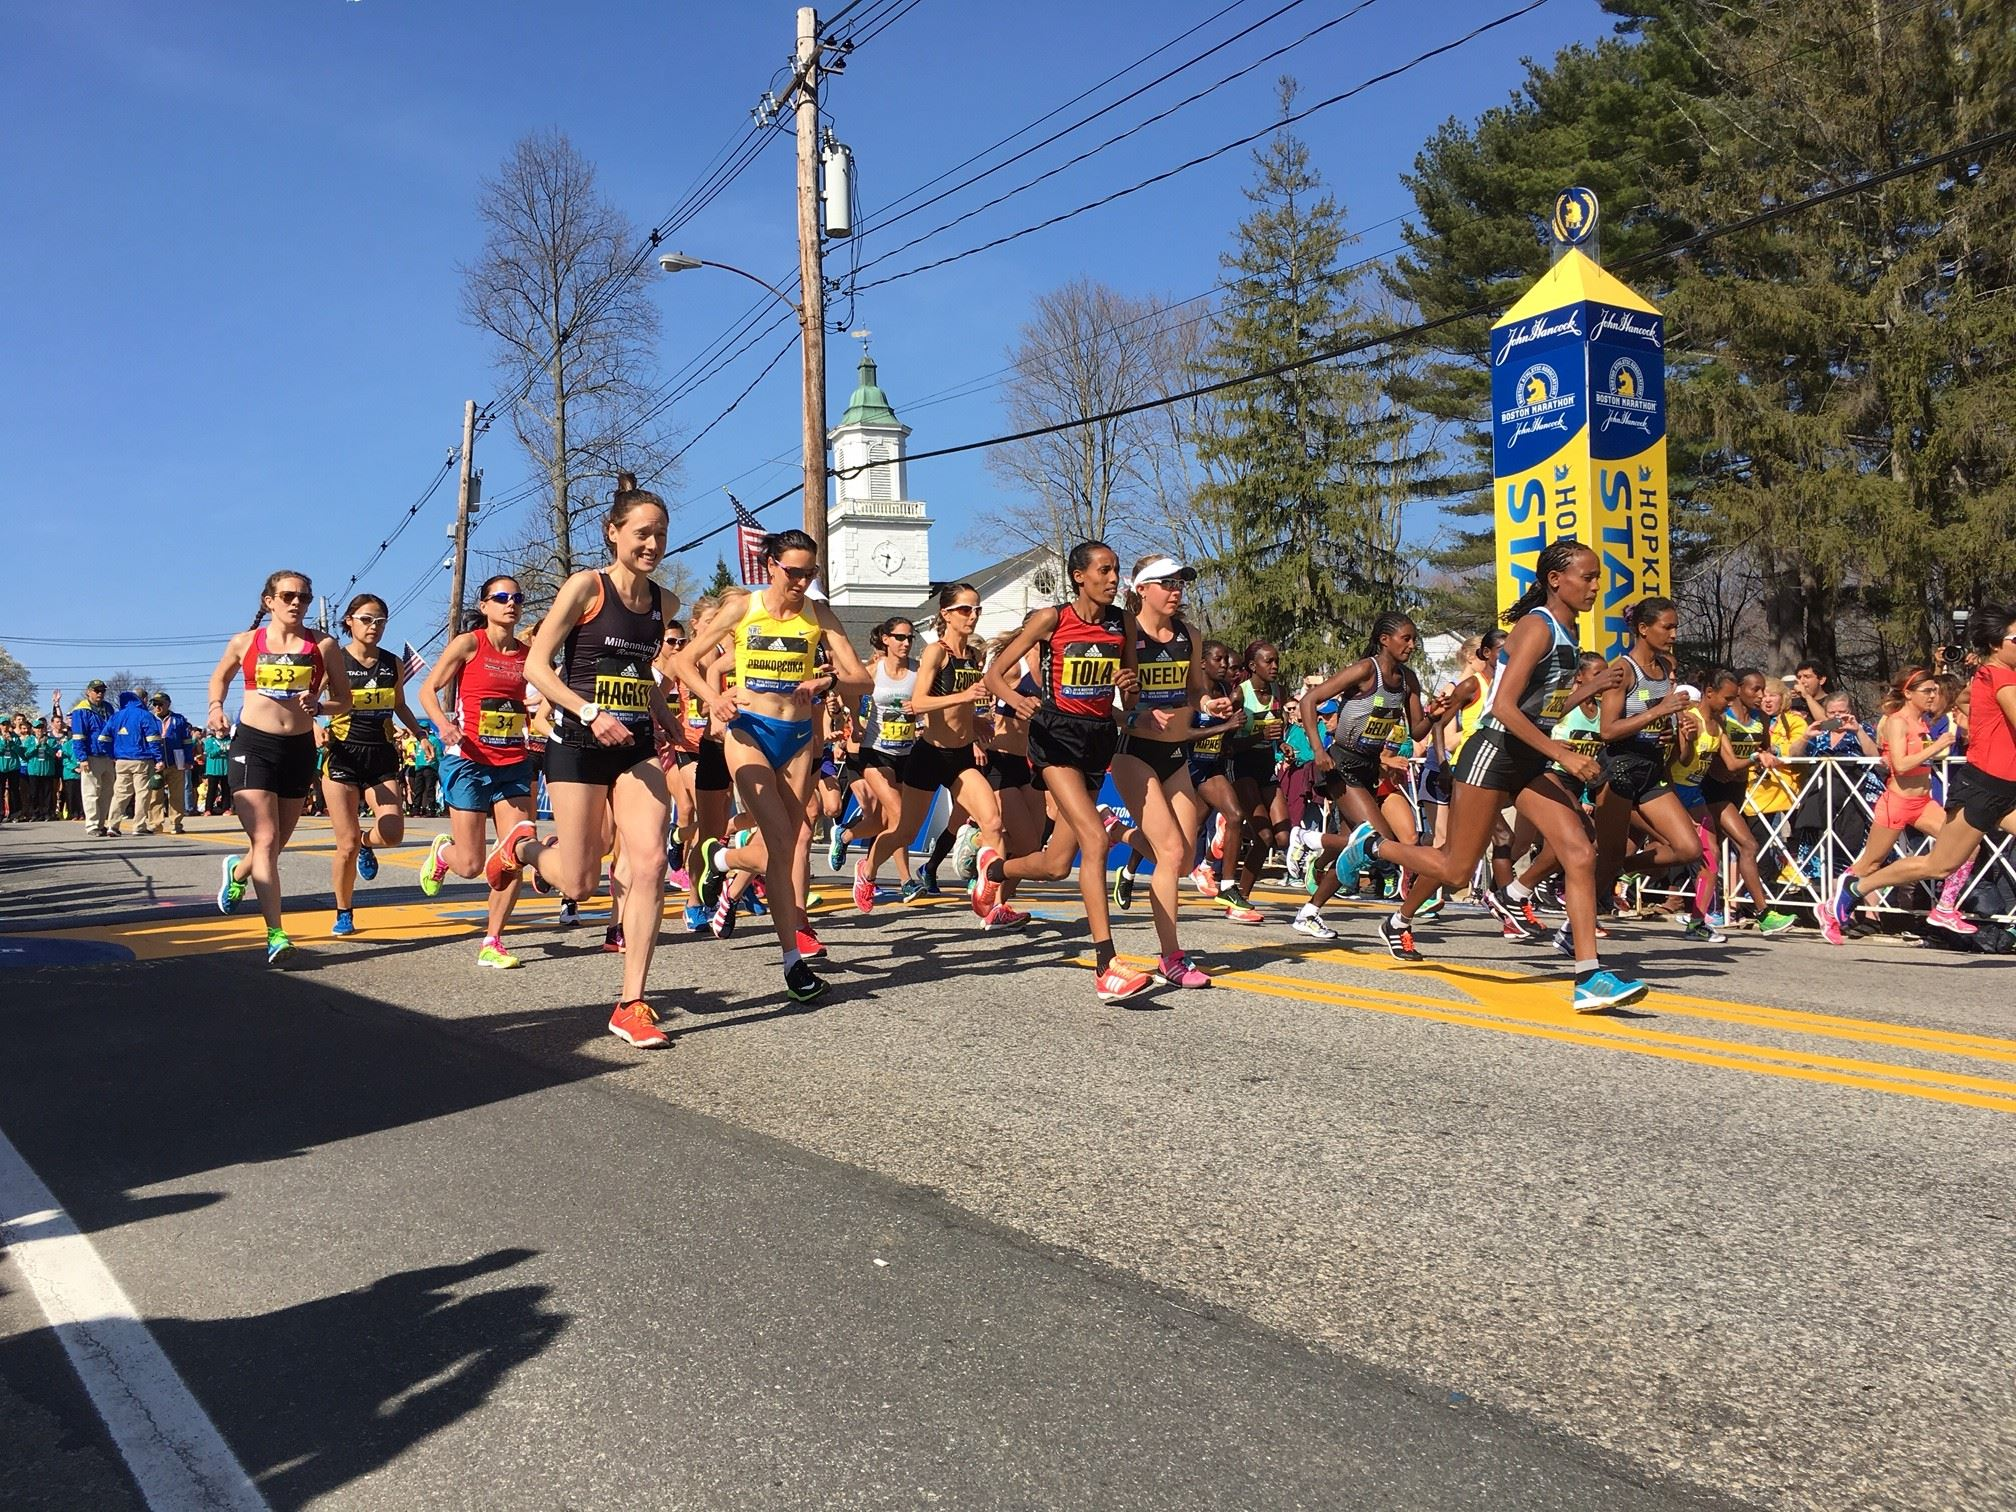 Boston Marathon results